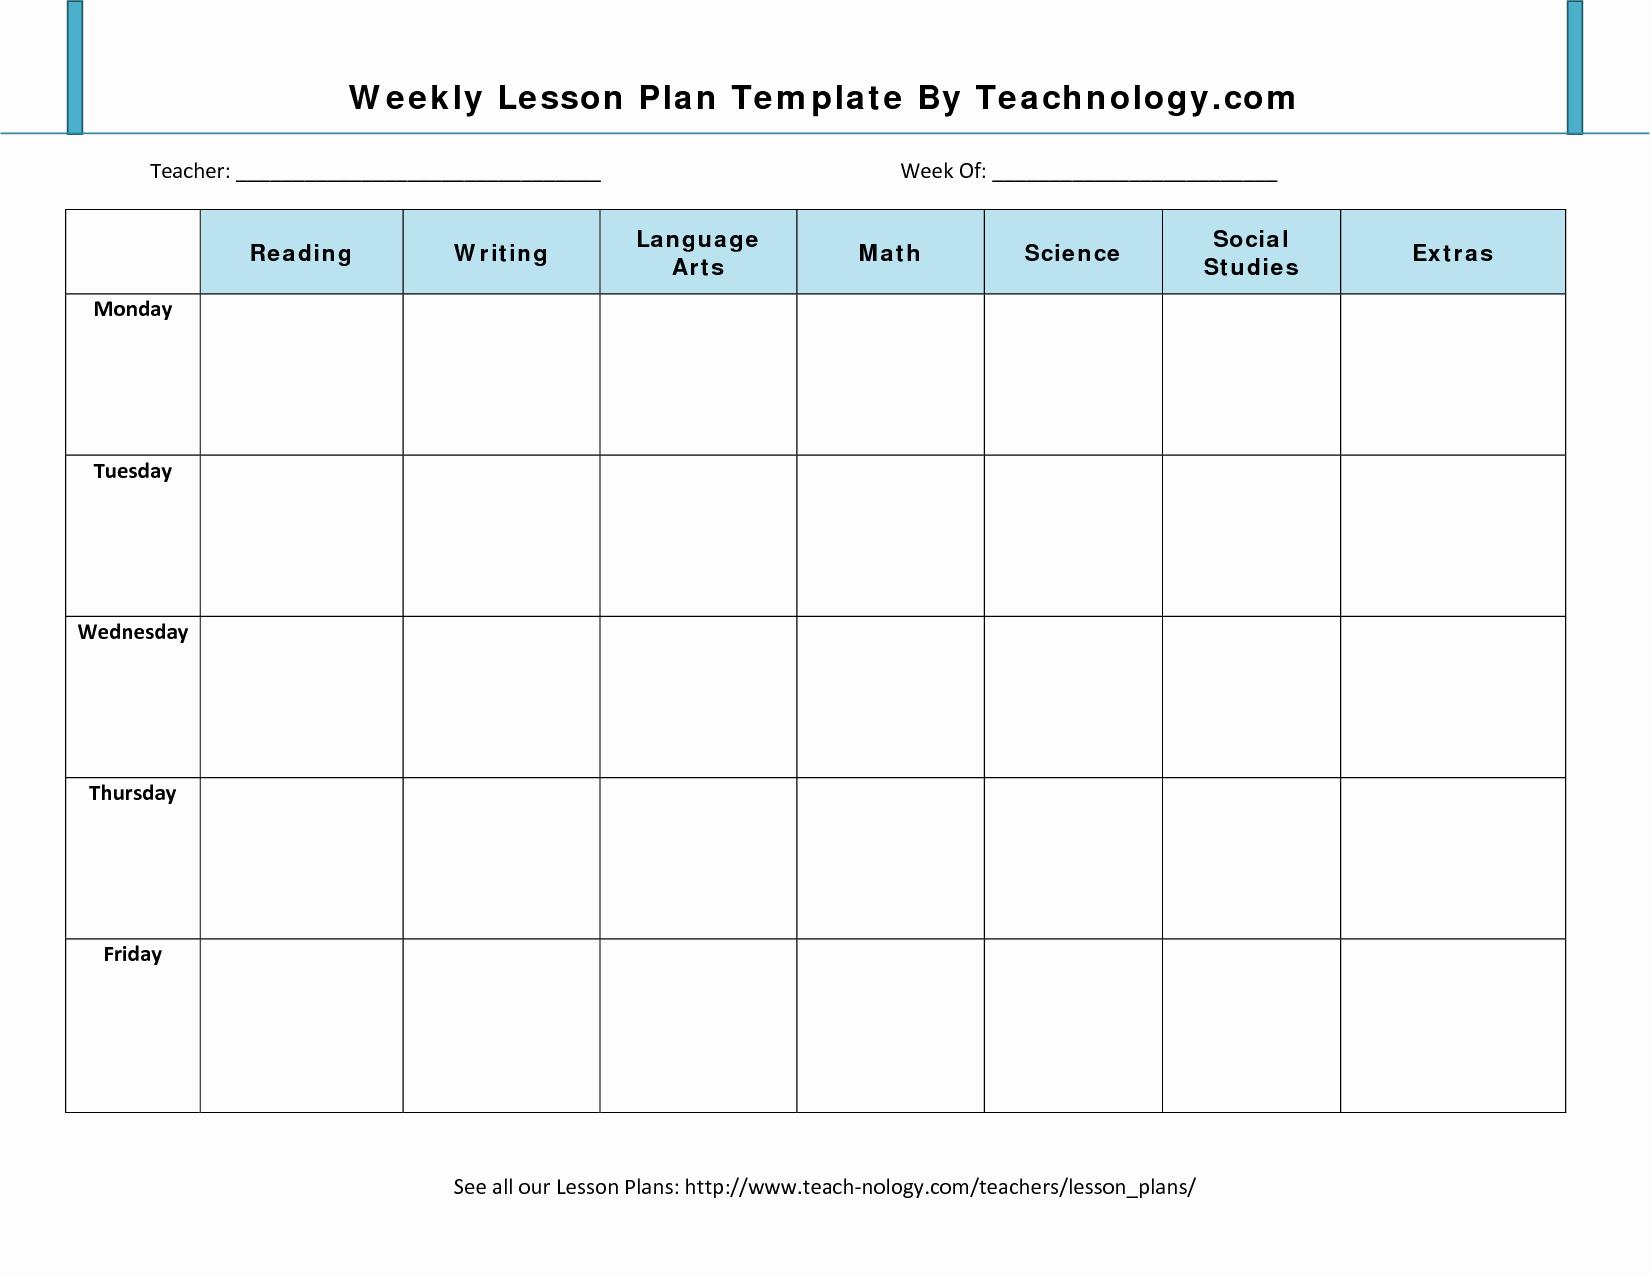 Teachers College Lesson Plan Template Fresh Lesson Plan format 7 Weekly Lesson Plan Template for